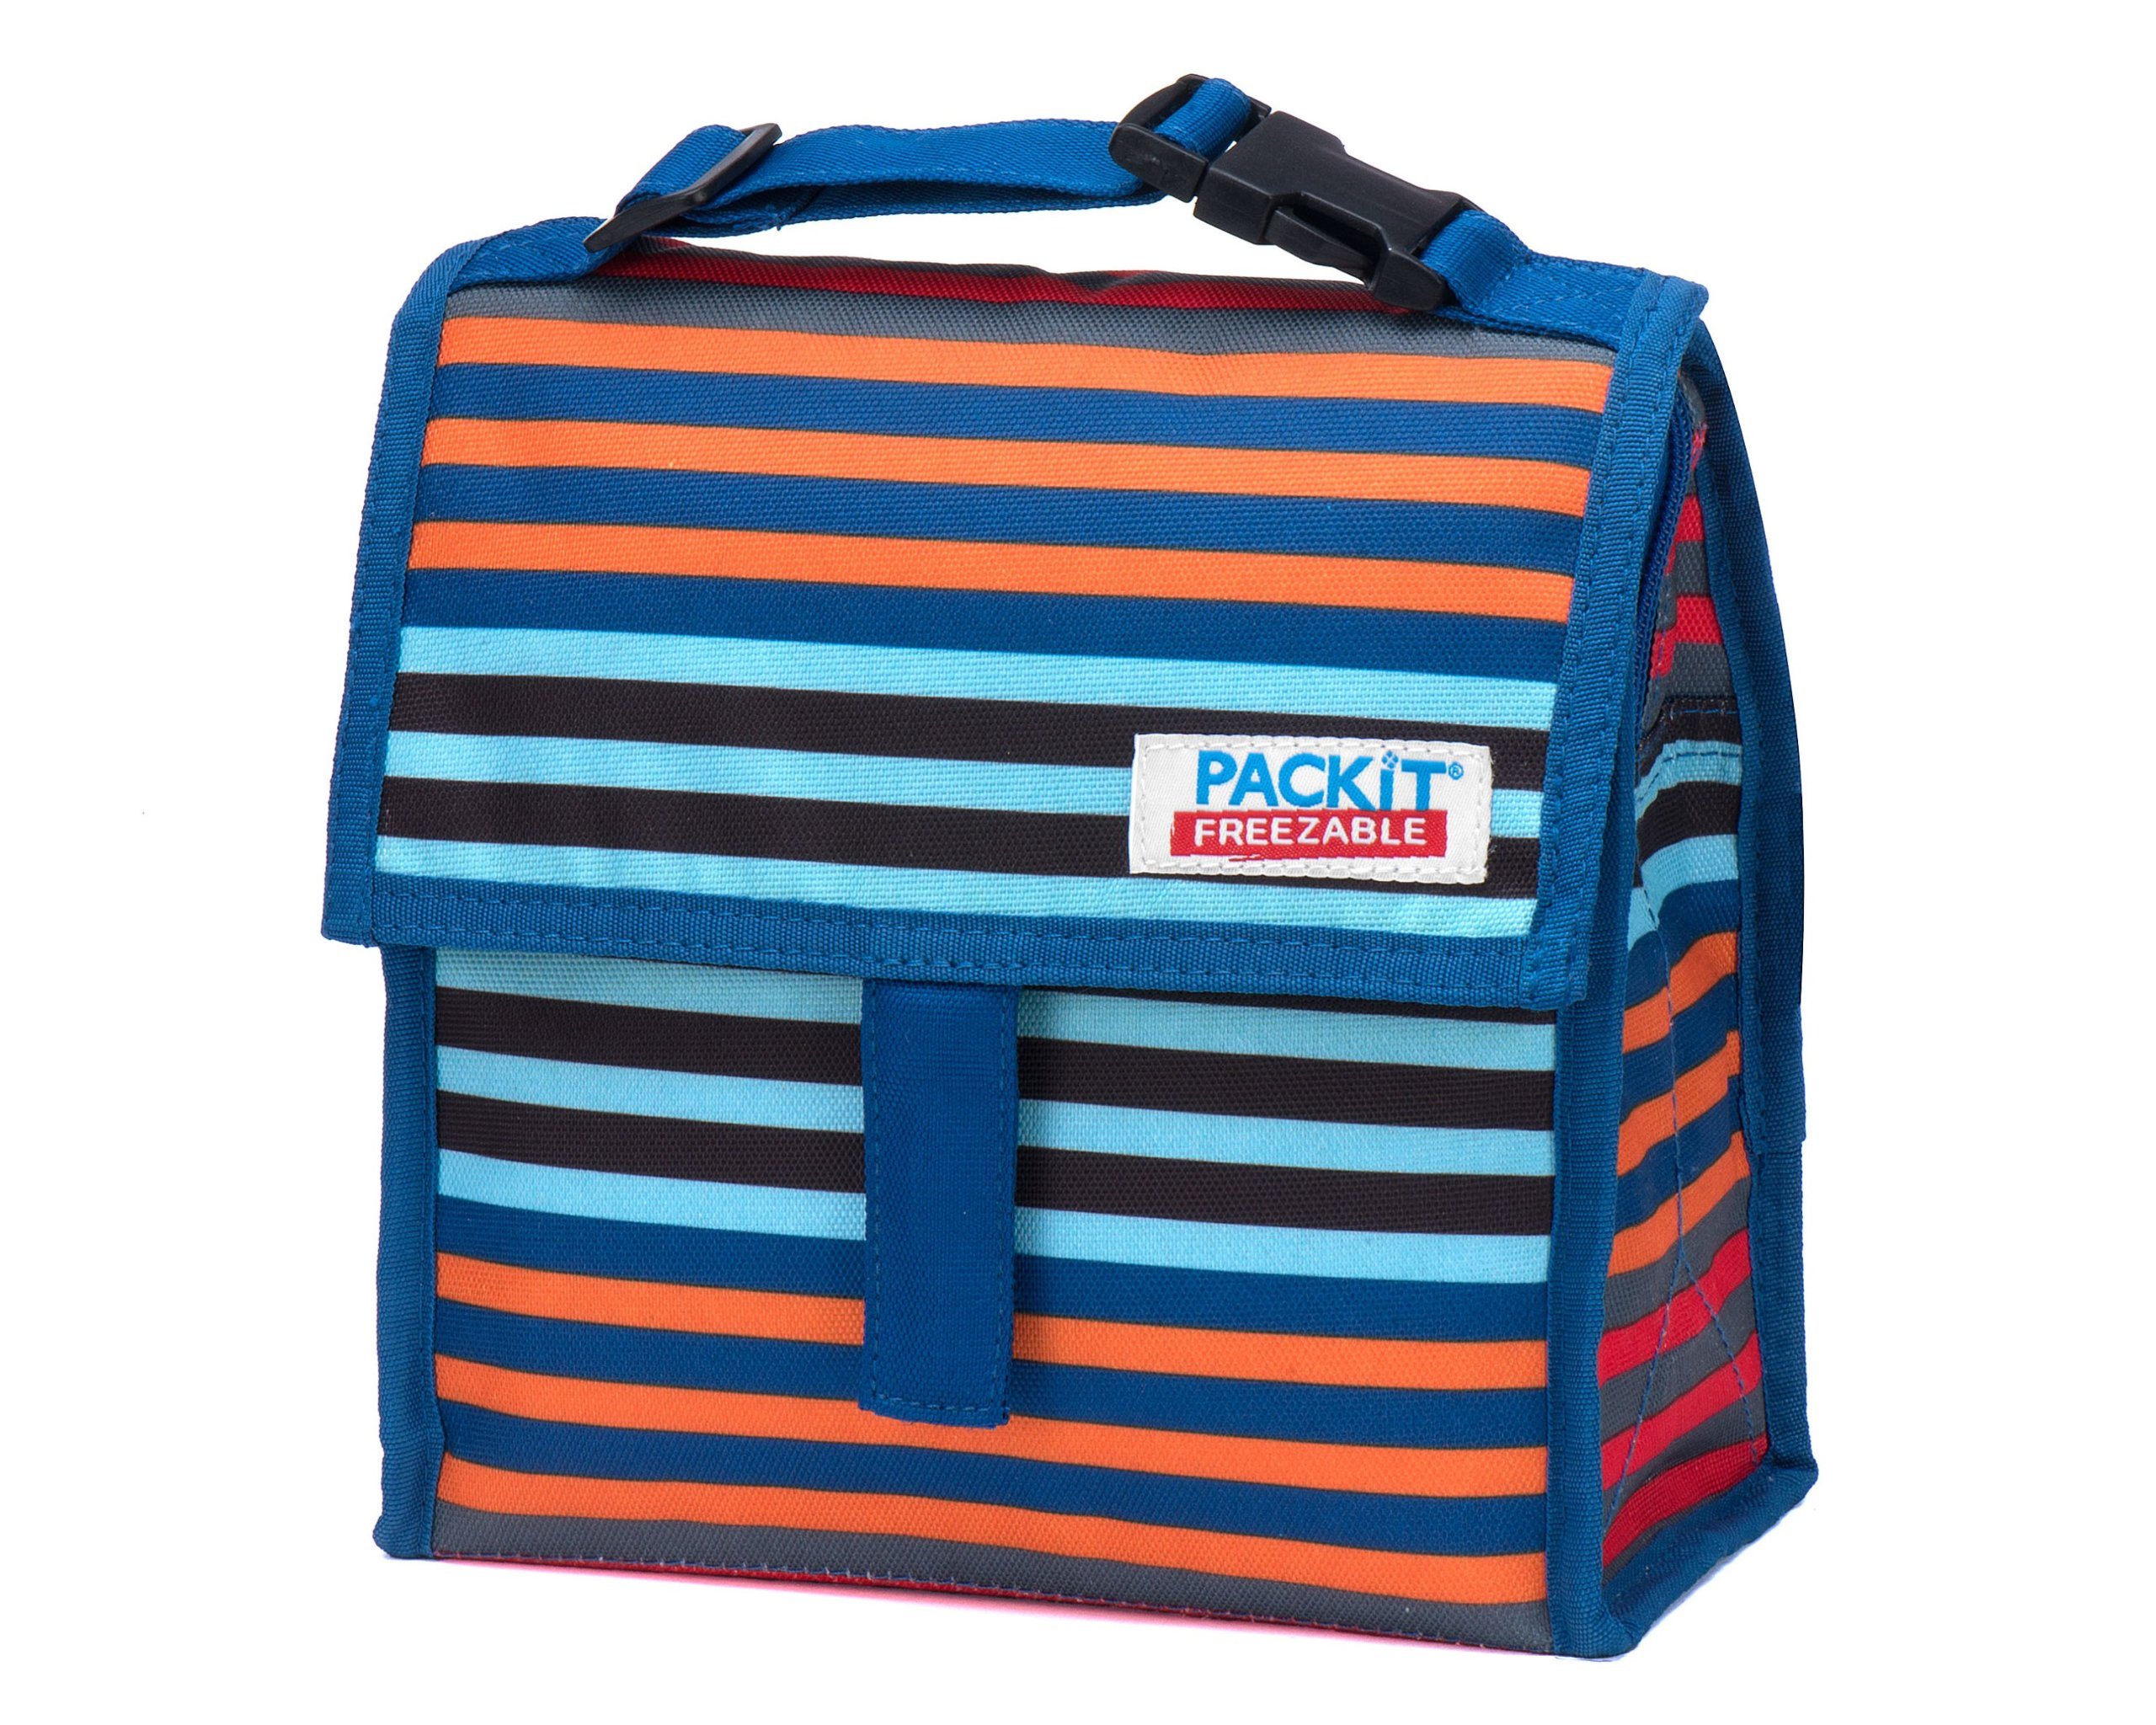 PackIt Freezable Mini Lunch Bag, Cali Stripes